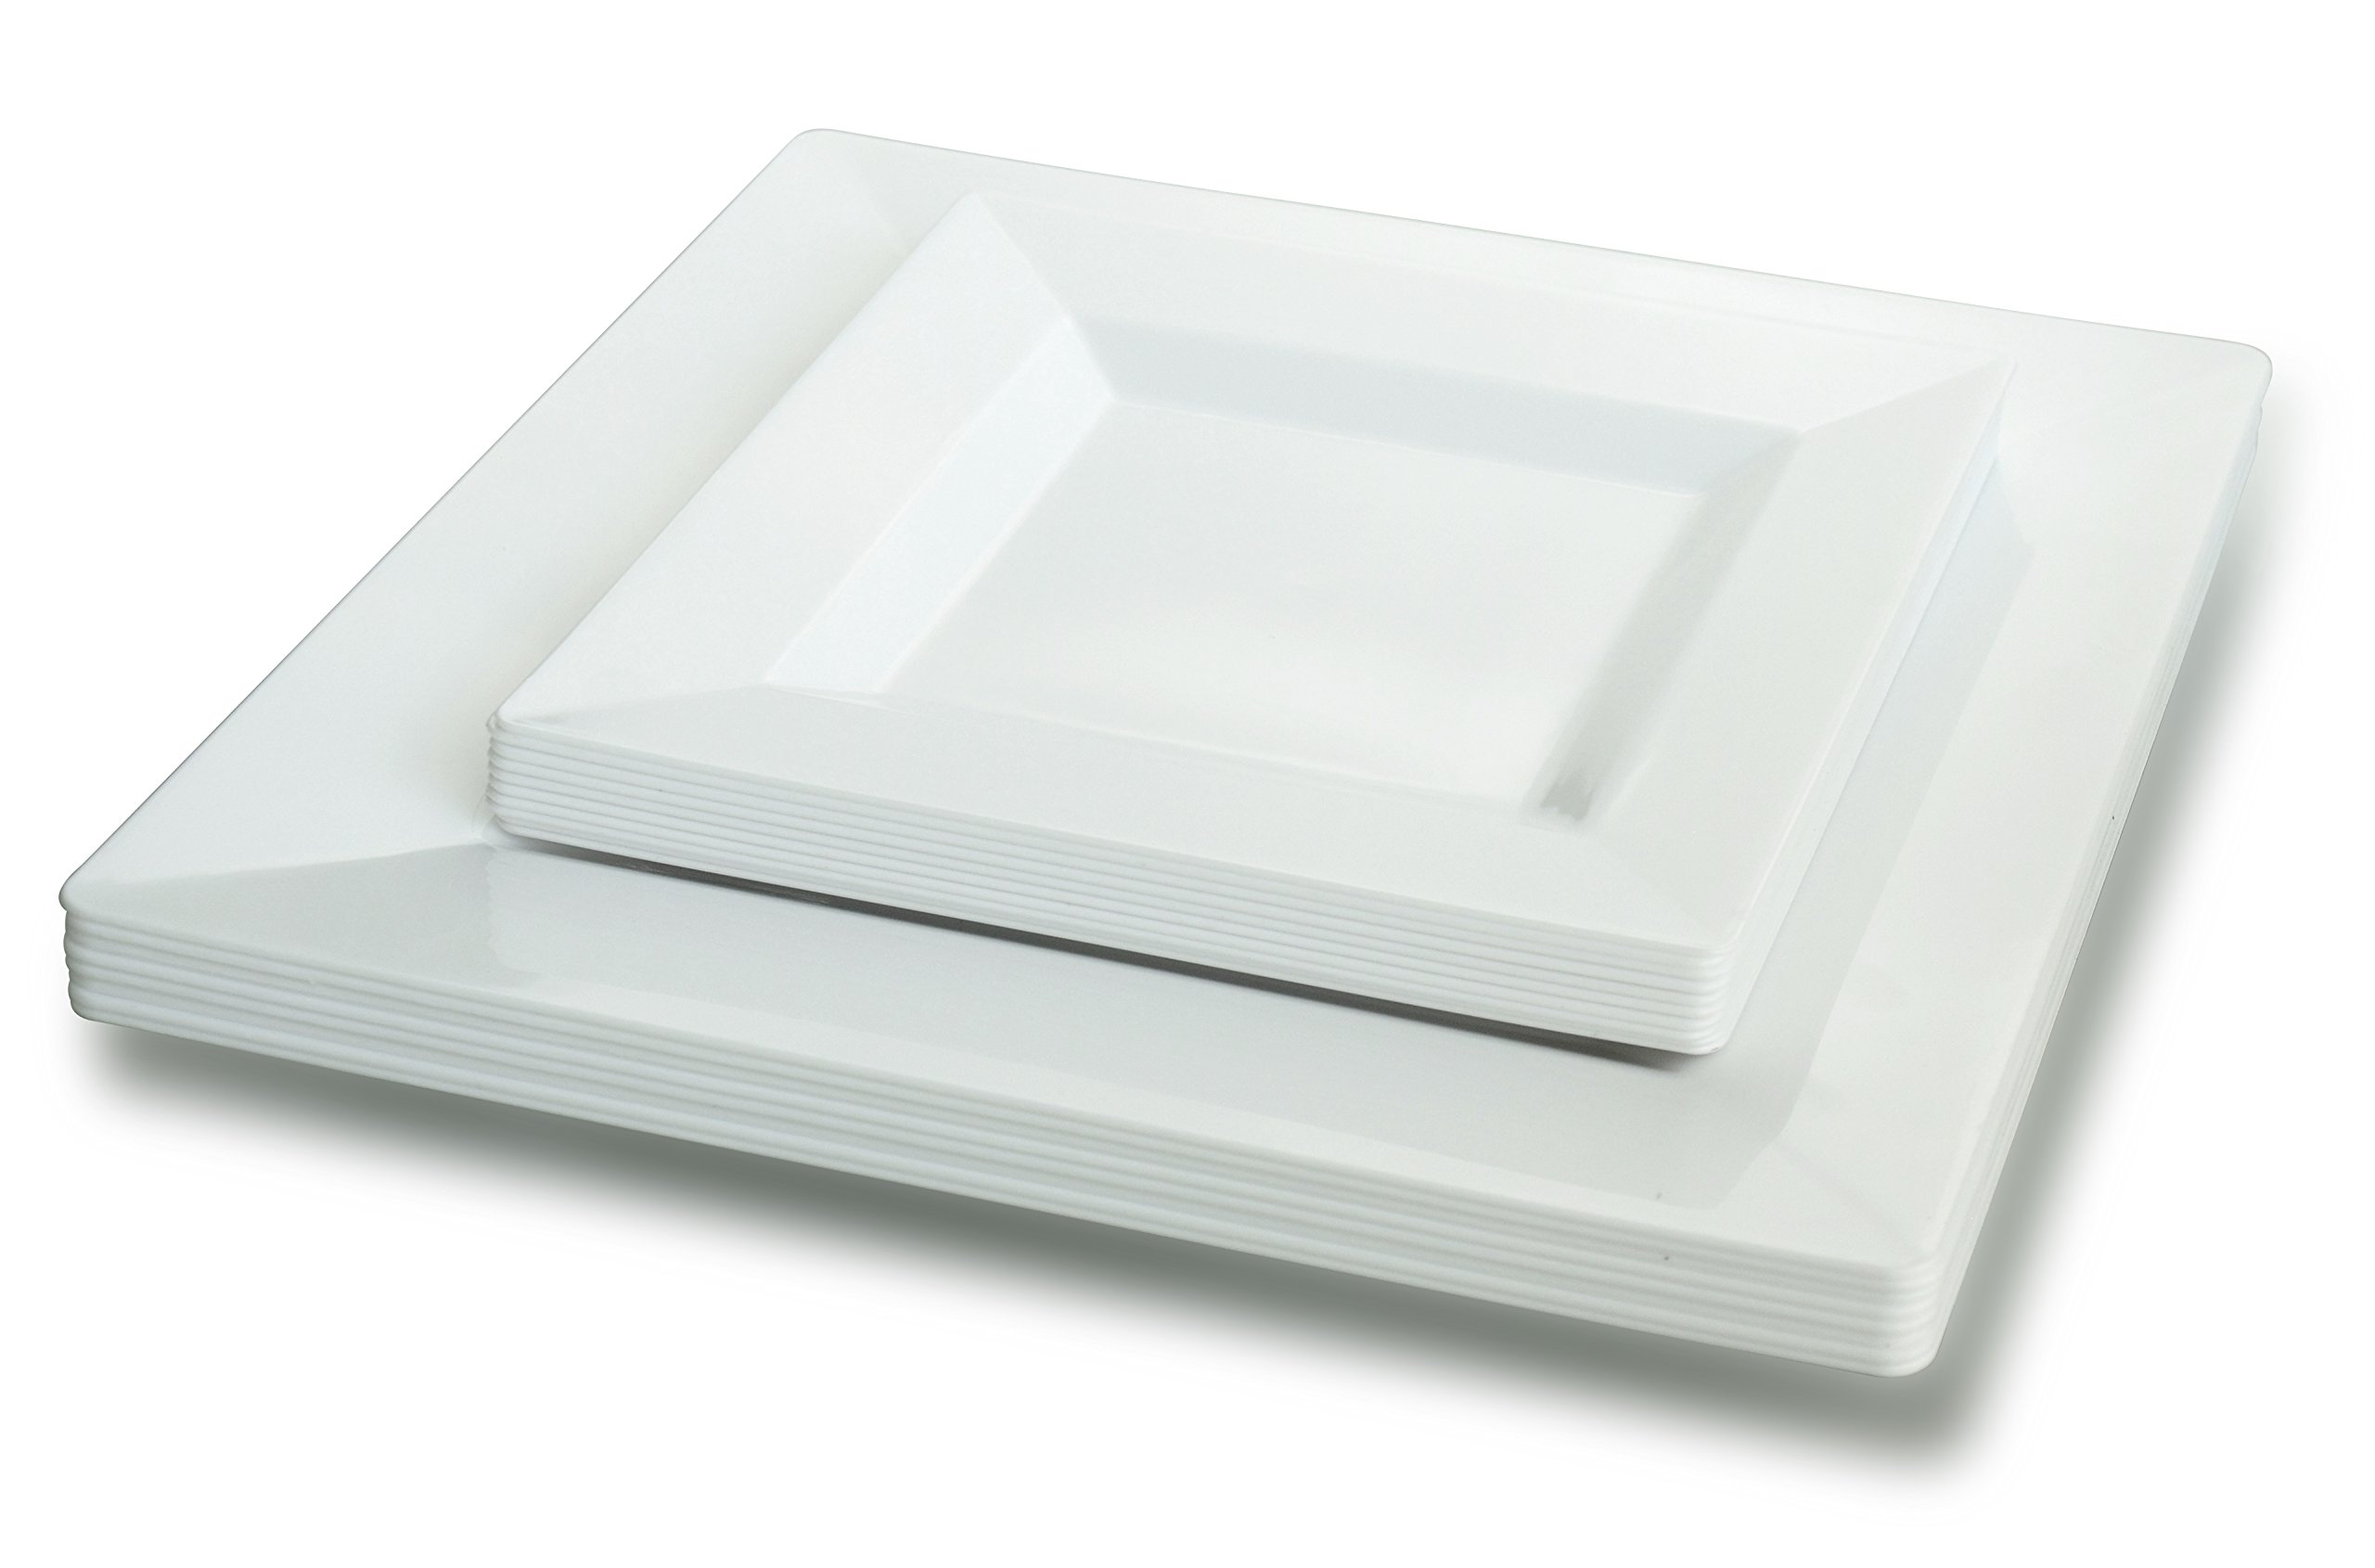 '' OCCASIONS '' 240 Pack Disposable Square Plastic Plates Set - 120 x 9.5'' Dinner + 120 x 6.5'' Dessert (Square White)…